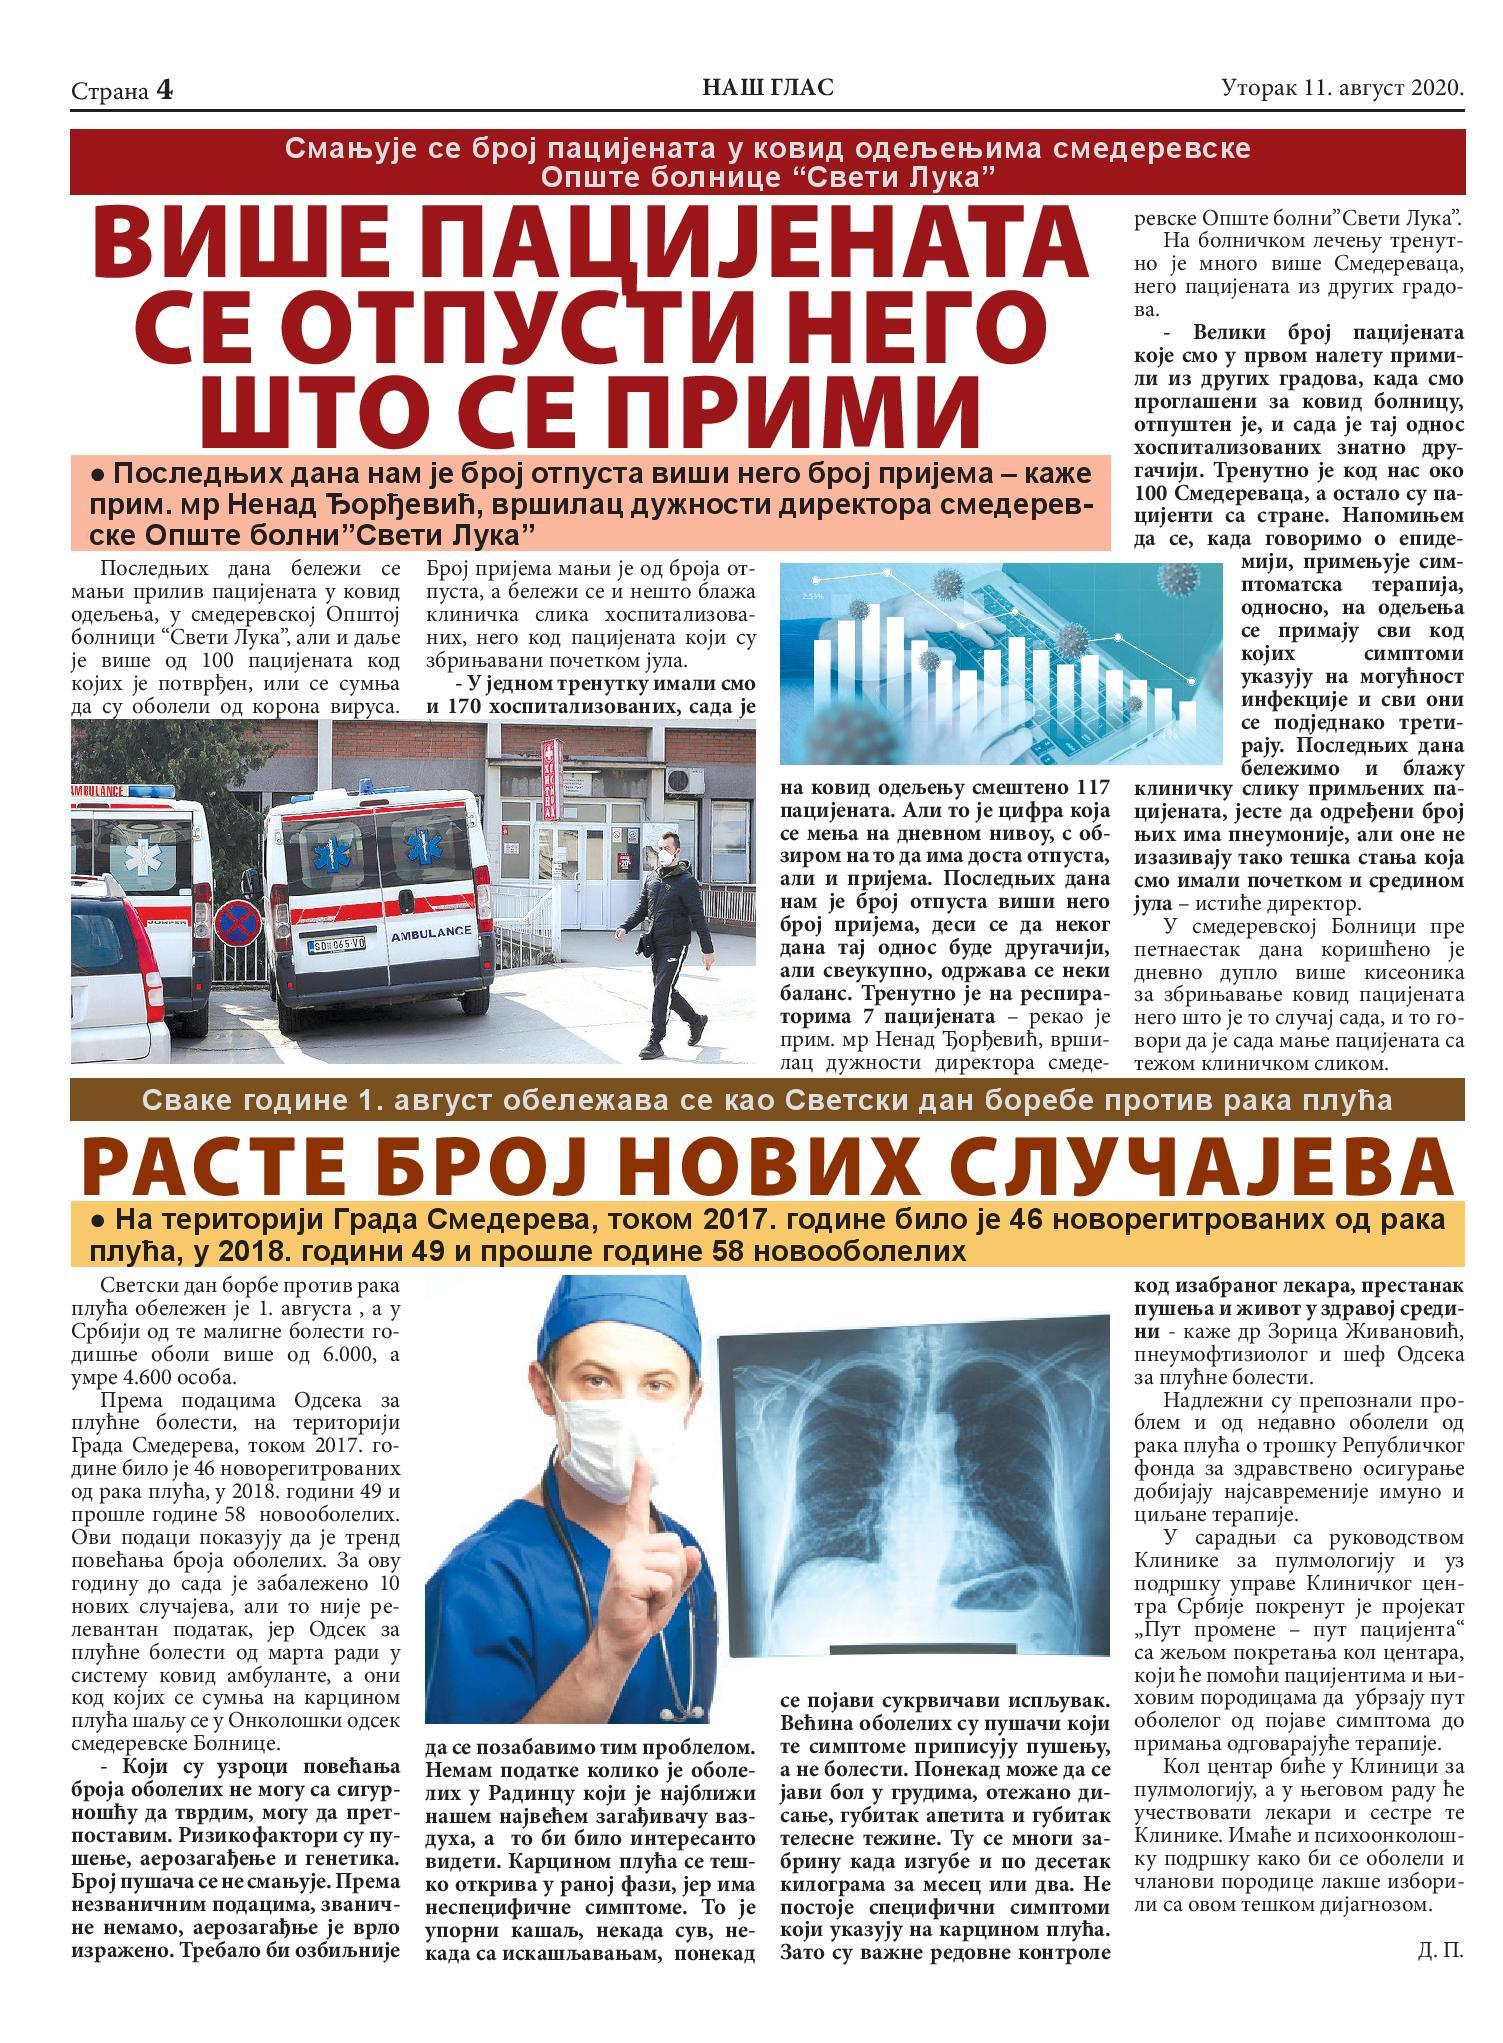 Општа болница